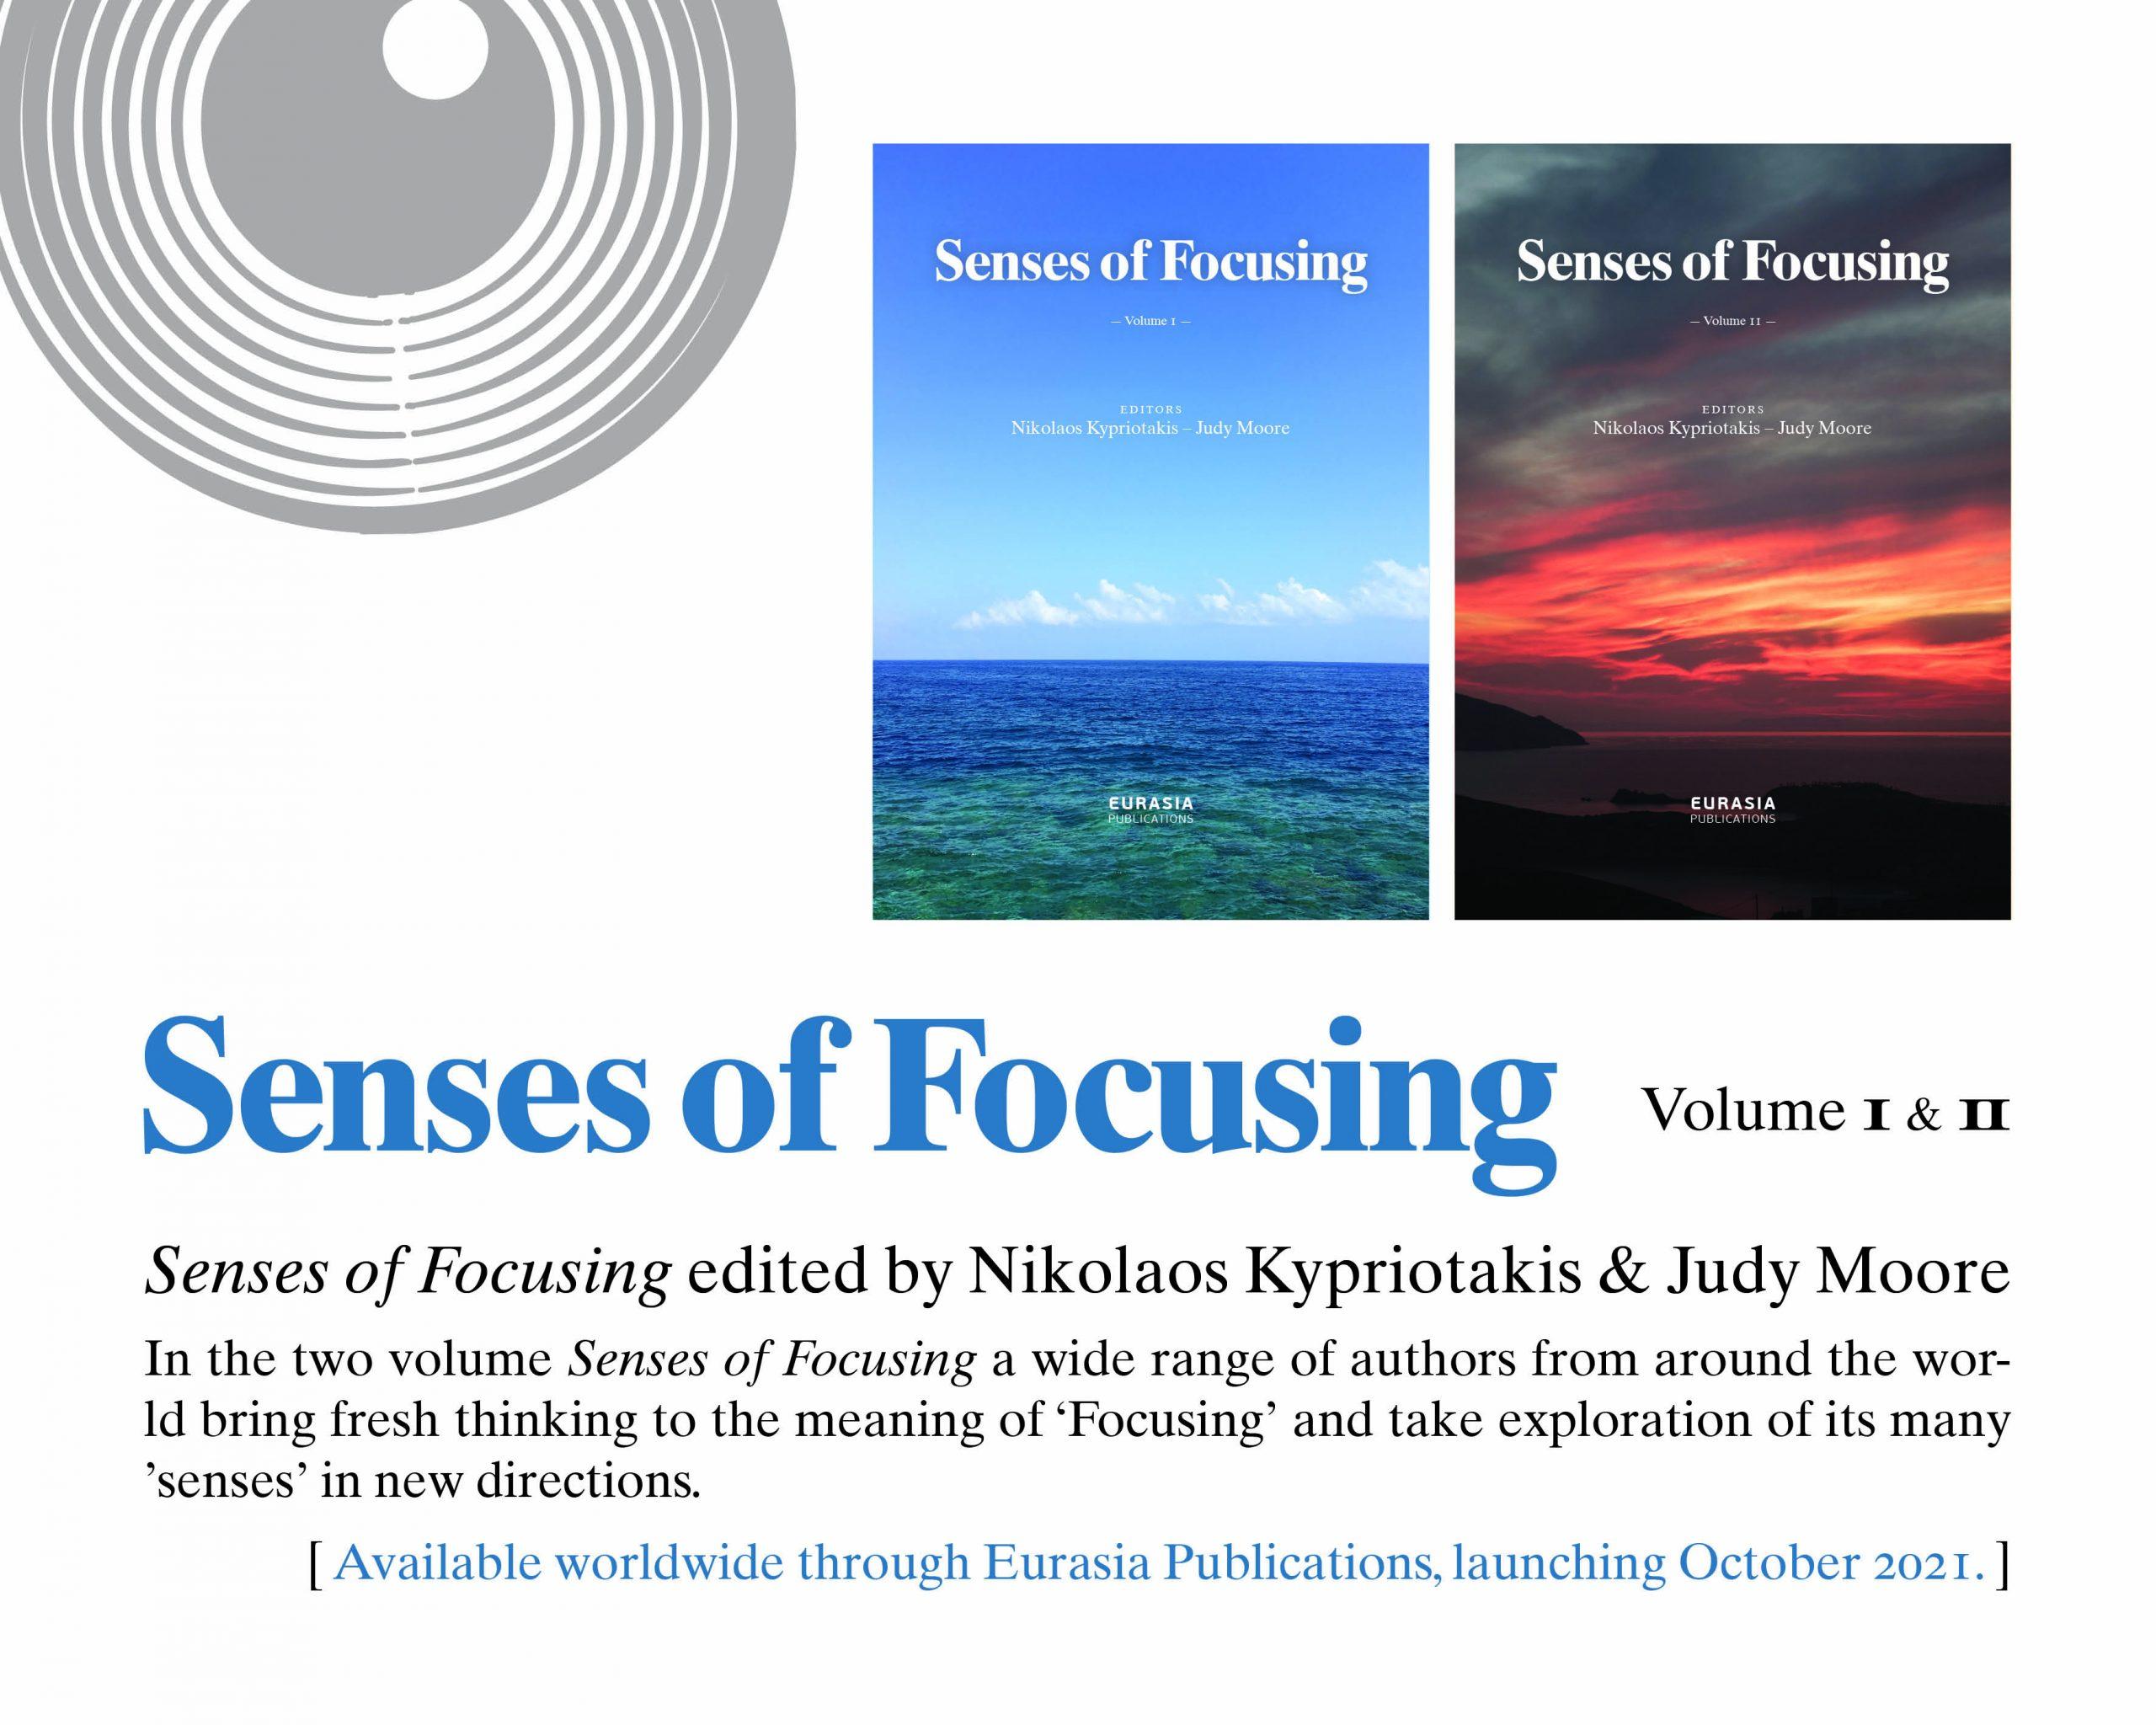 Senses of Focusing – Volumes I & II